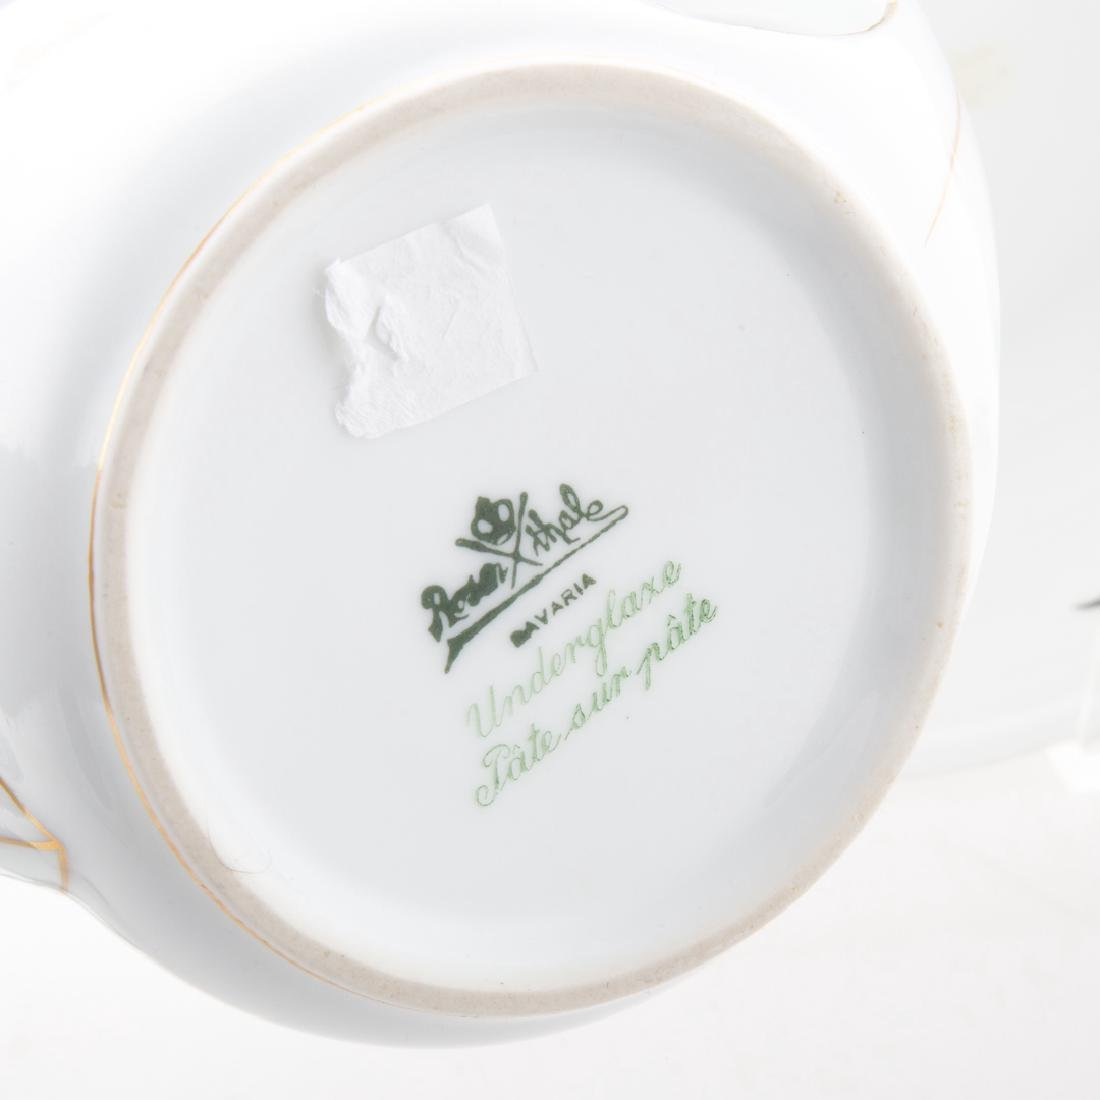 9 pcs. Rosenthal Pate-sur-Pate Donatello porcelain - 3